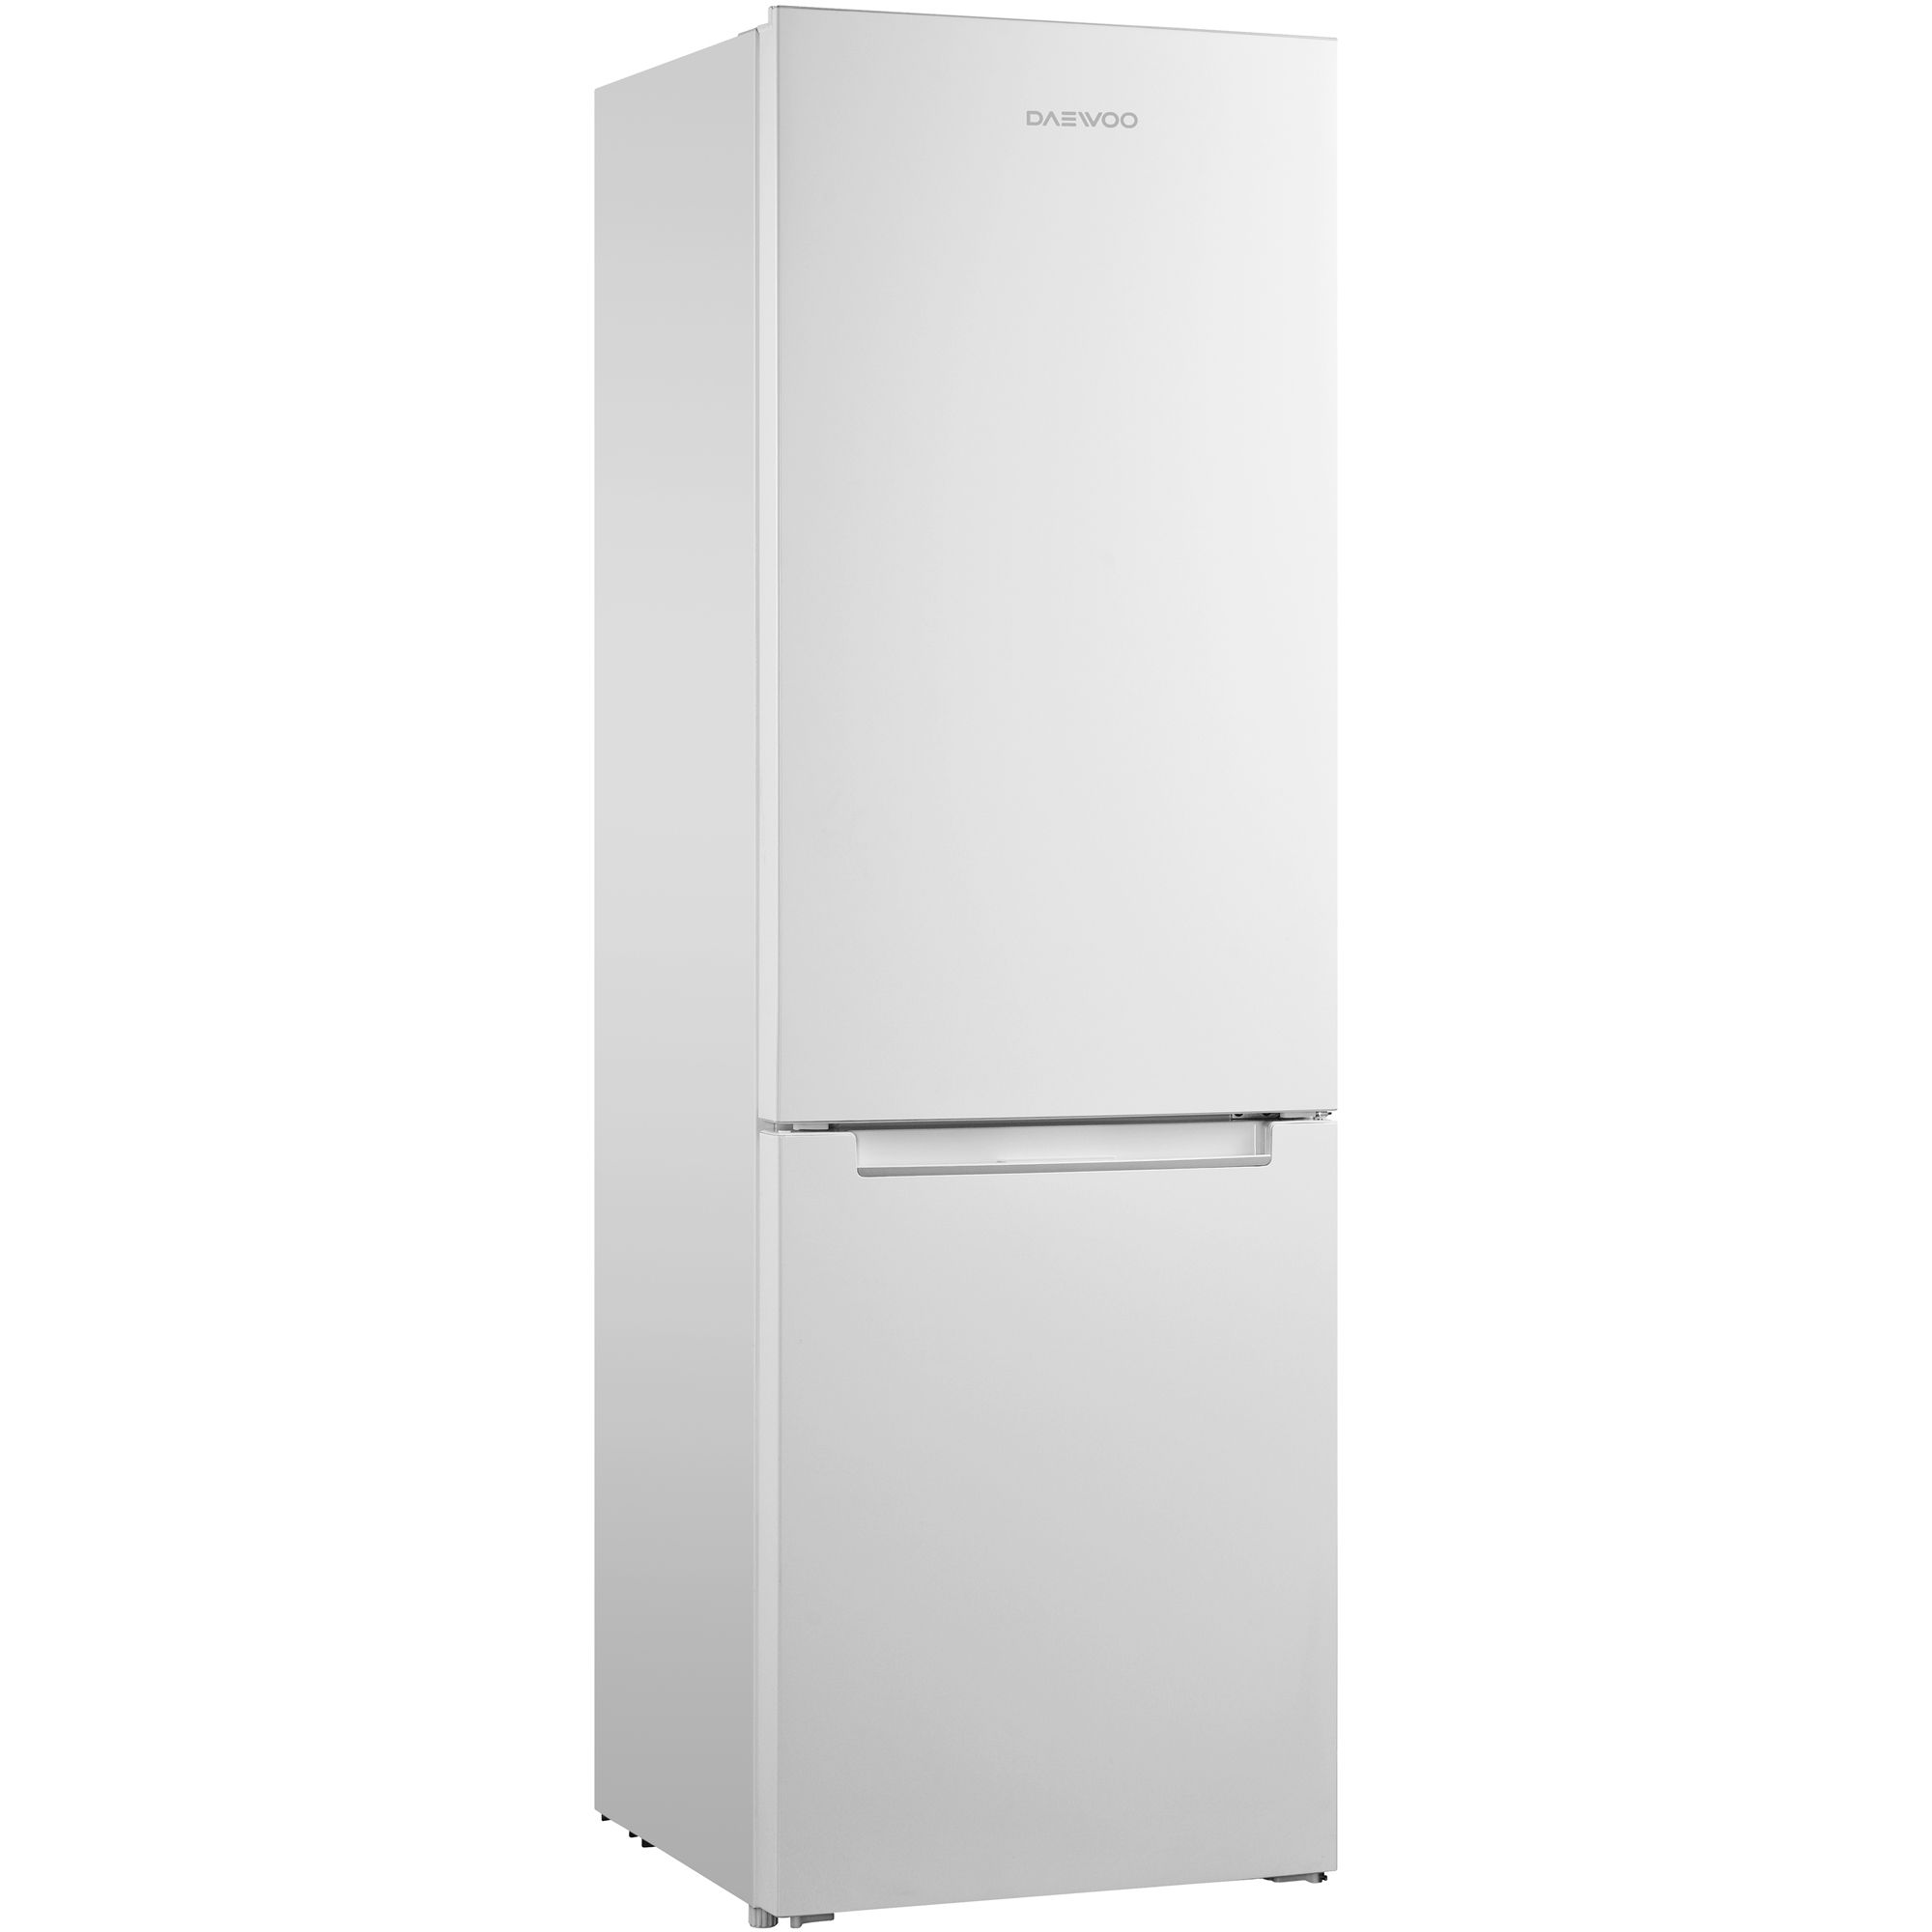 Combina frigorifica Daewoo RN-390W, 312 l, Clasa A+, H 185 cm, Alb